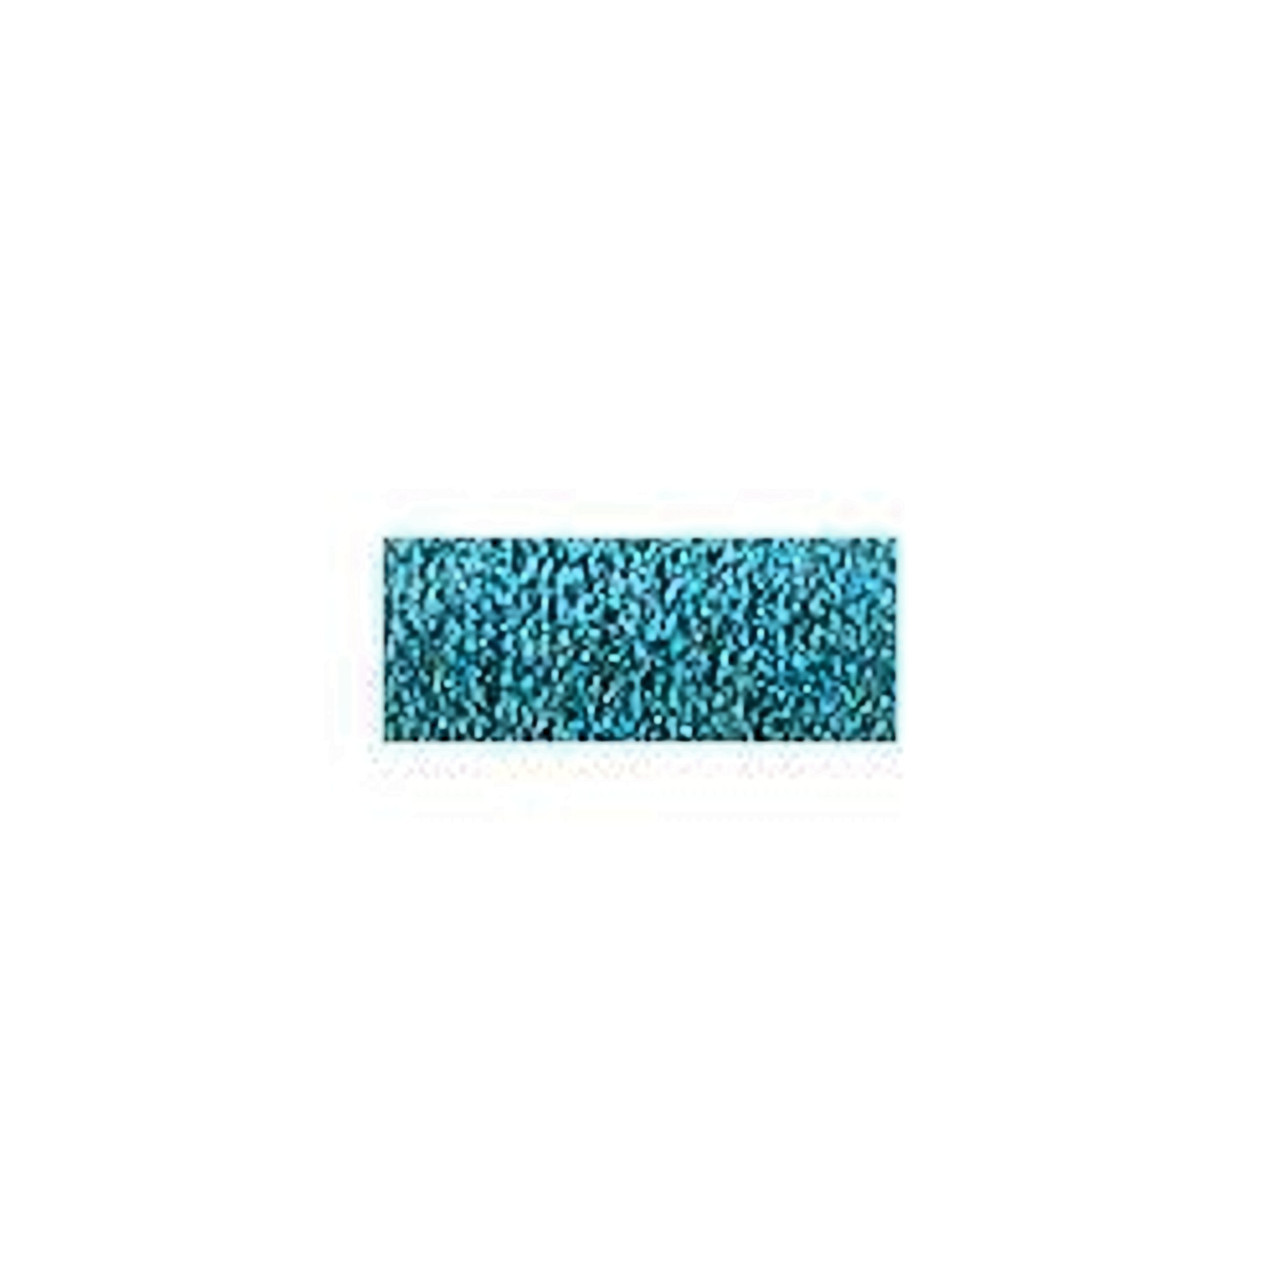 Kreinik Metallics Blending Filament - Turquoise 029